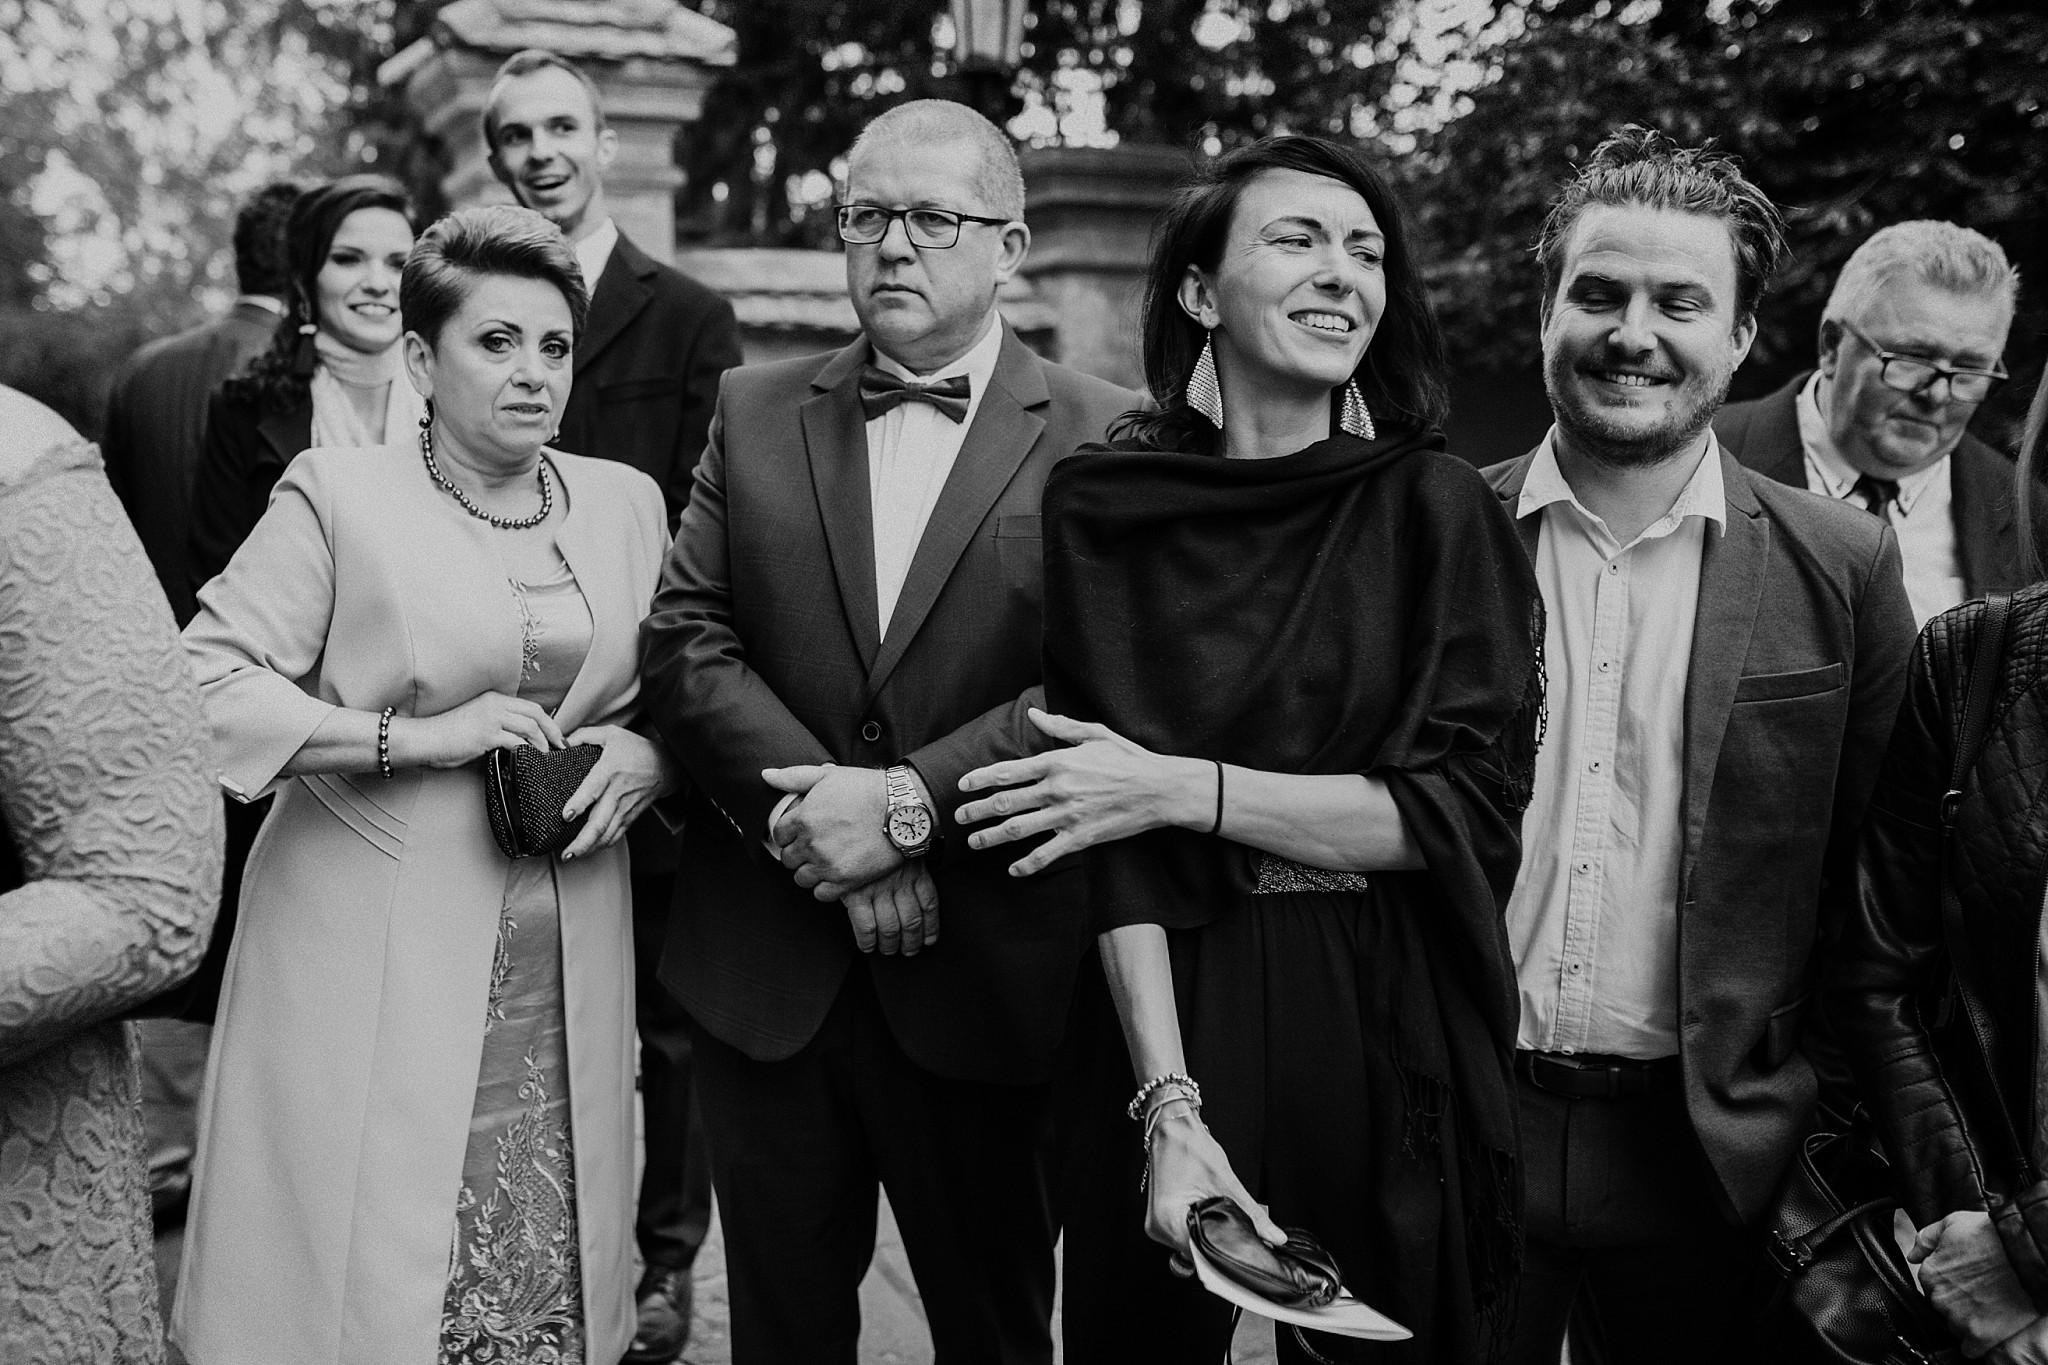 fotograf poznan wesele dobra truskawka piekne wesele pod poznaniem wesele w dobrej truskawce piekna para mloda slub marzen slub koronawirus slub listopad wesele koronawirus 226